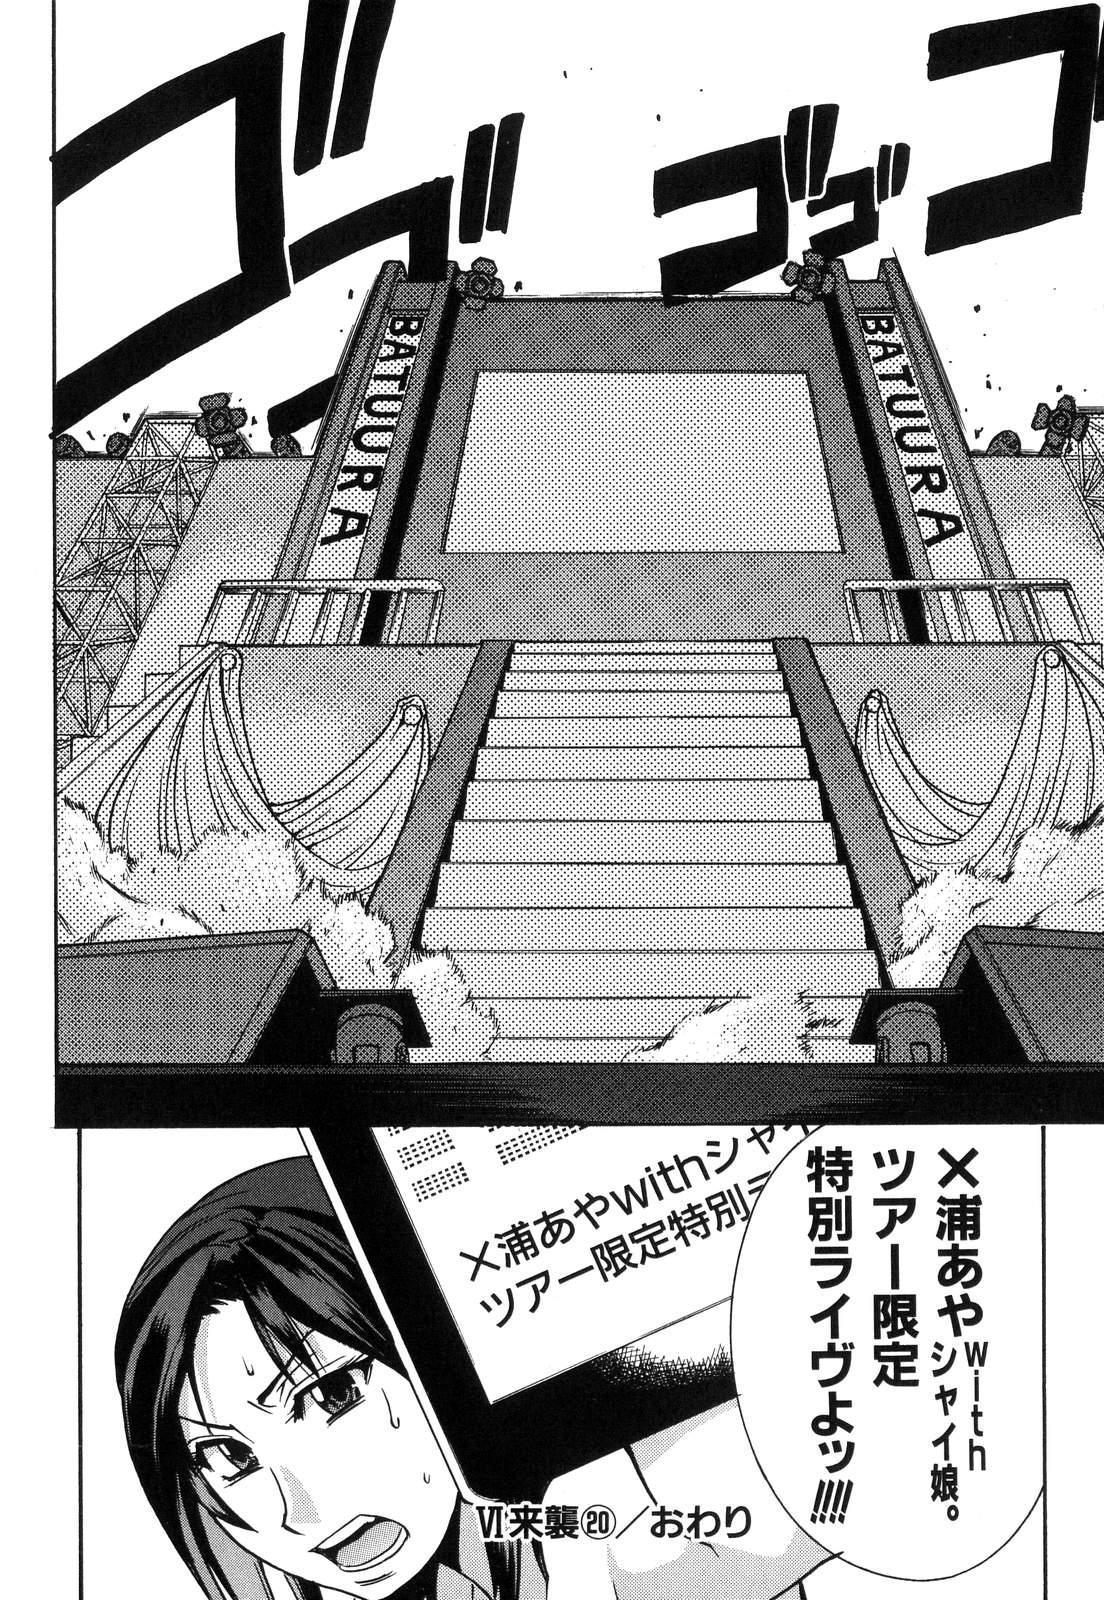 Shining Musume. 6. Rainbow Six 169